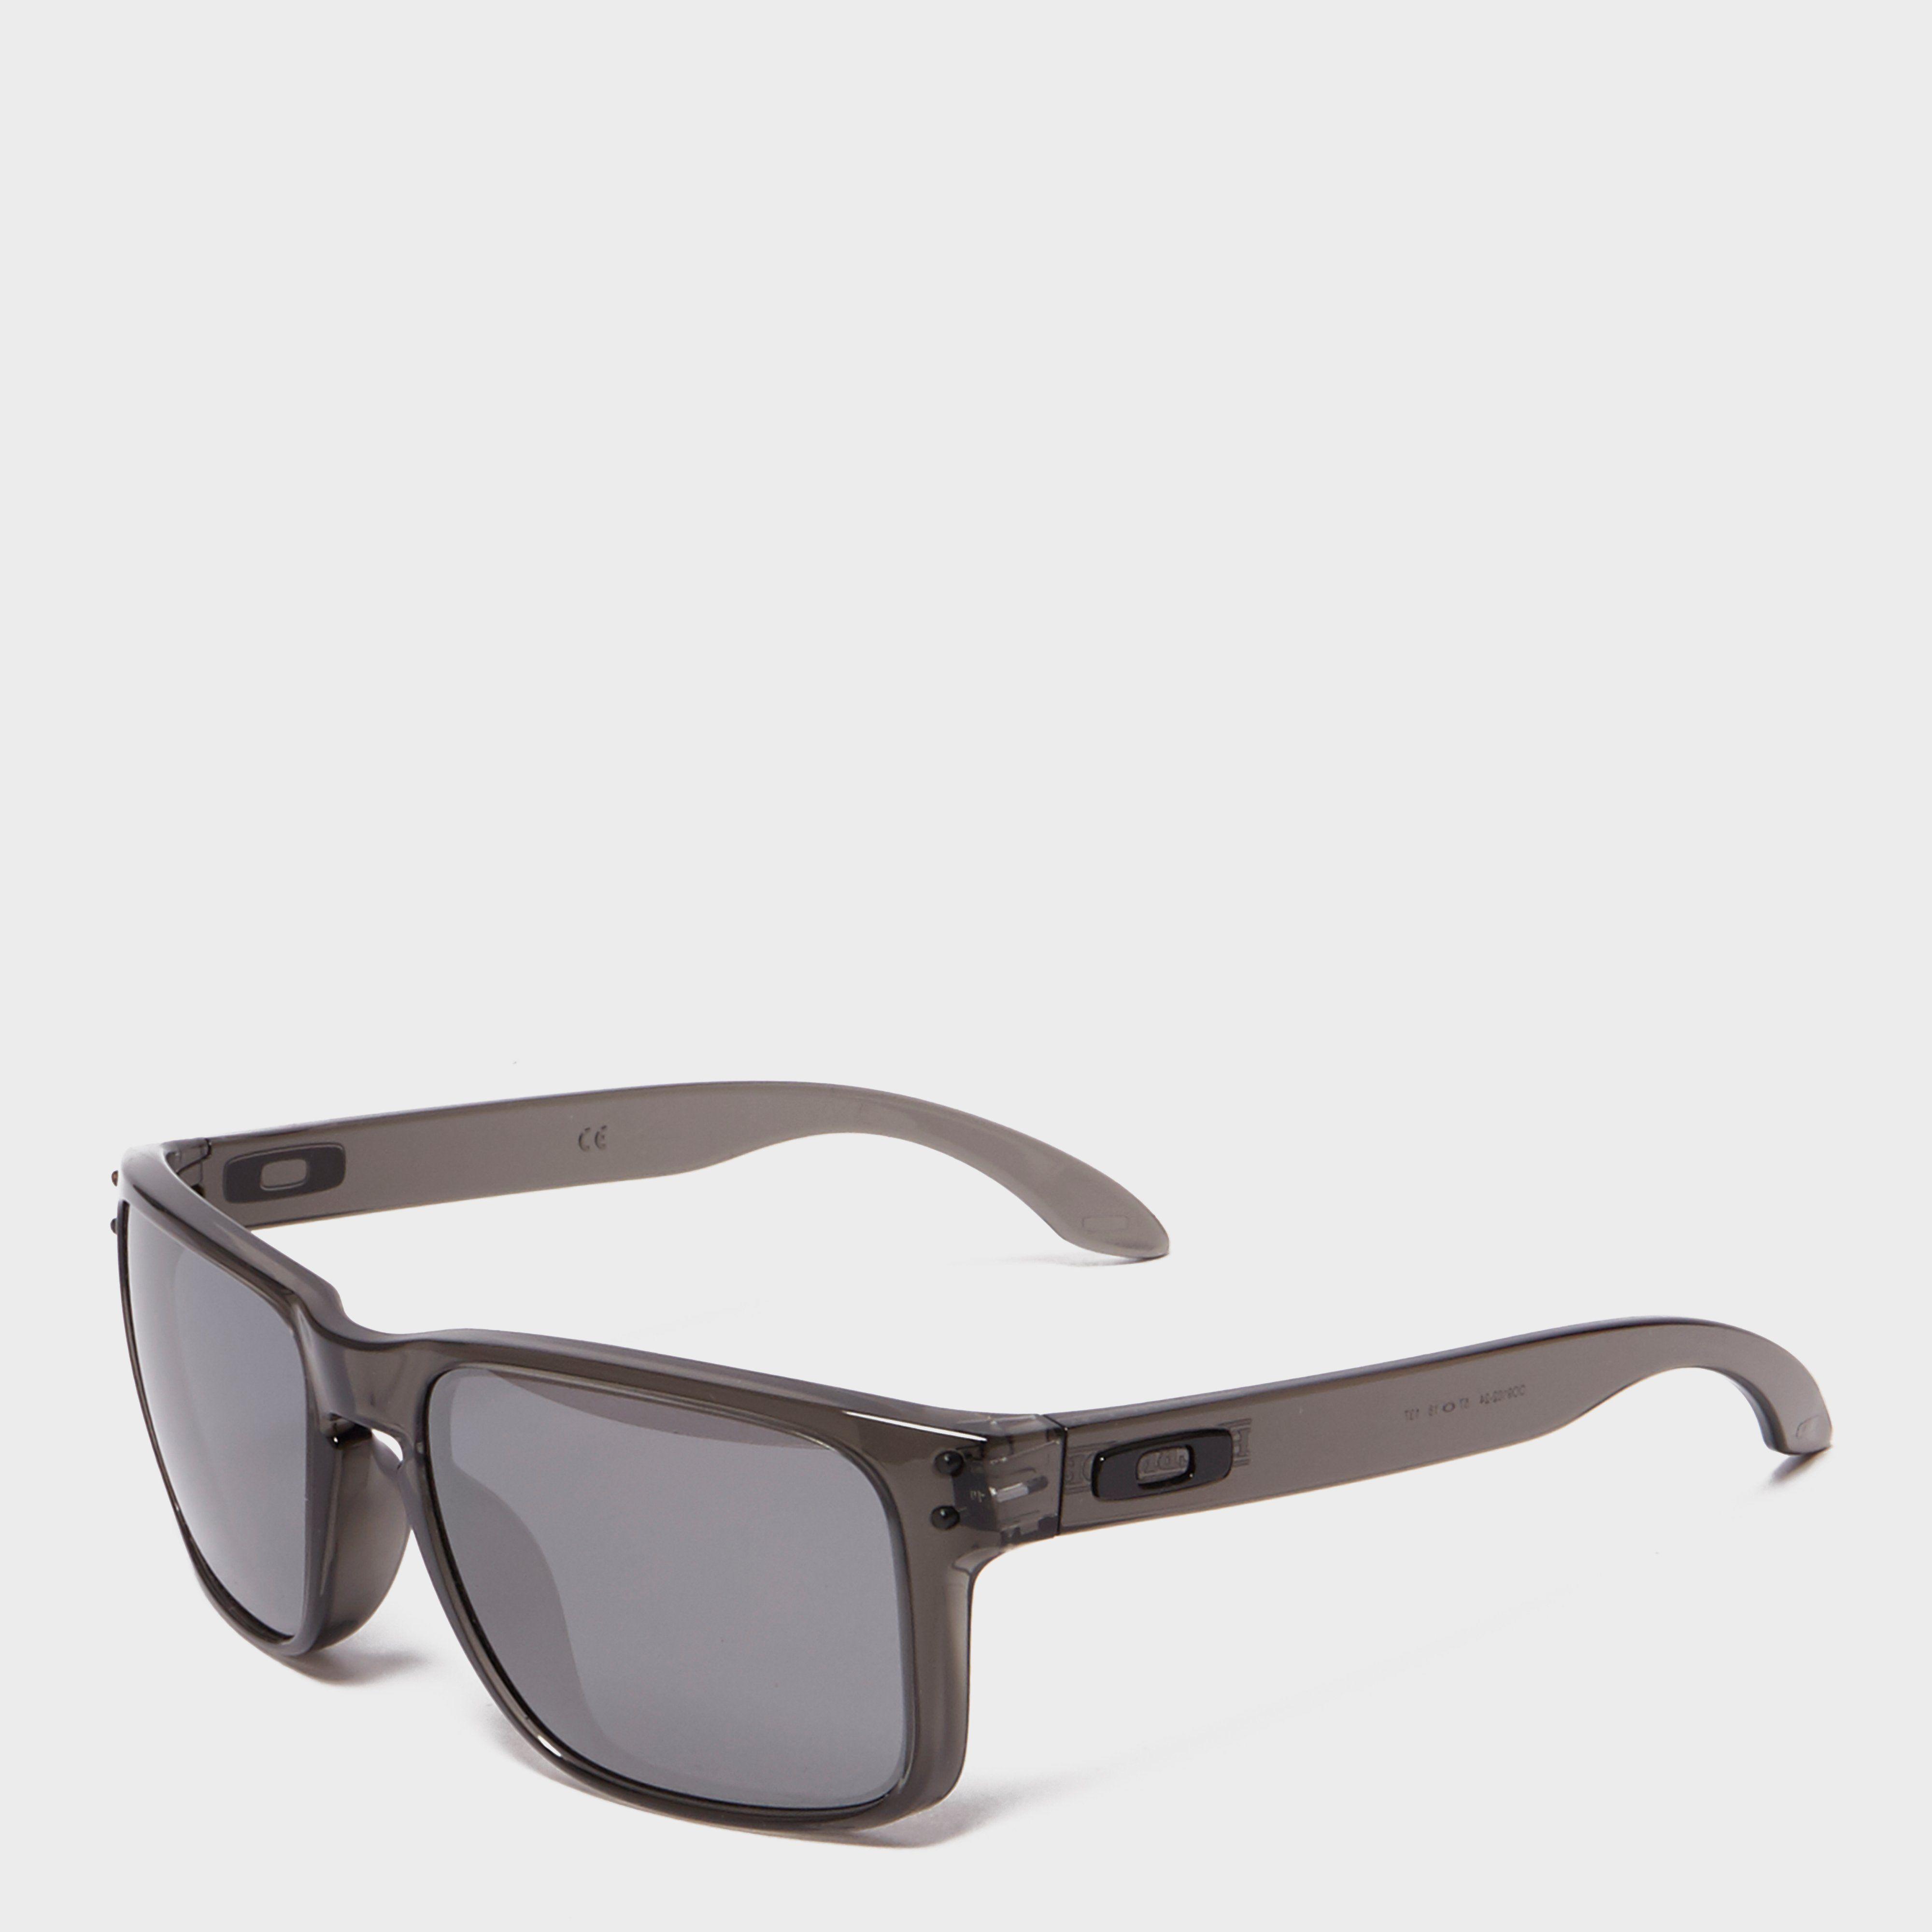 OAKLEY Holbrook Sunglasses Black